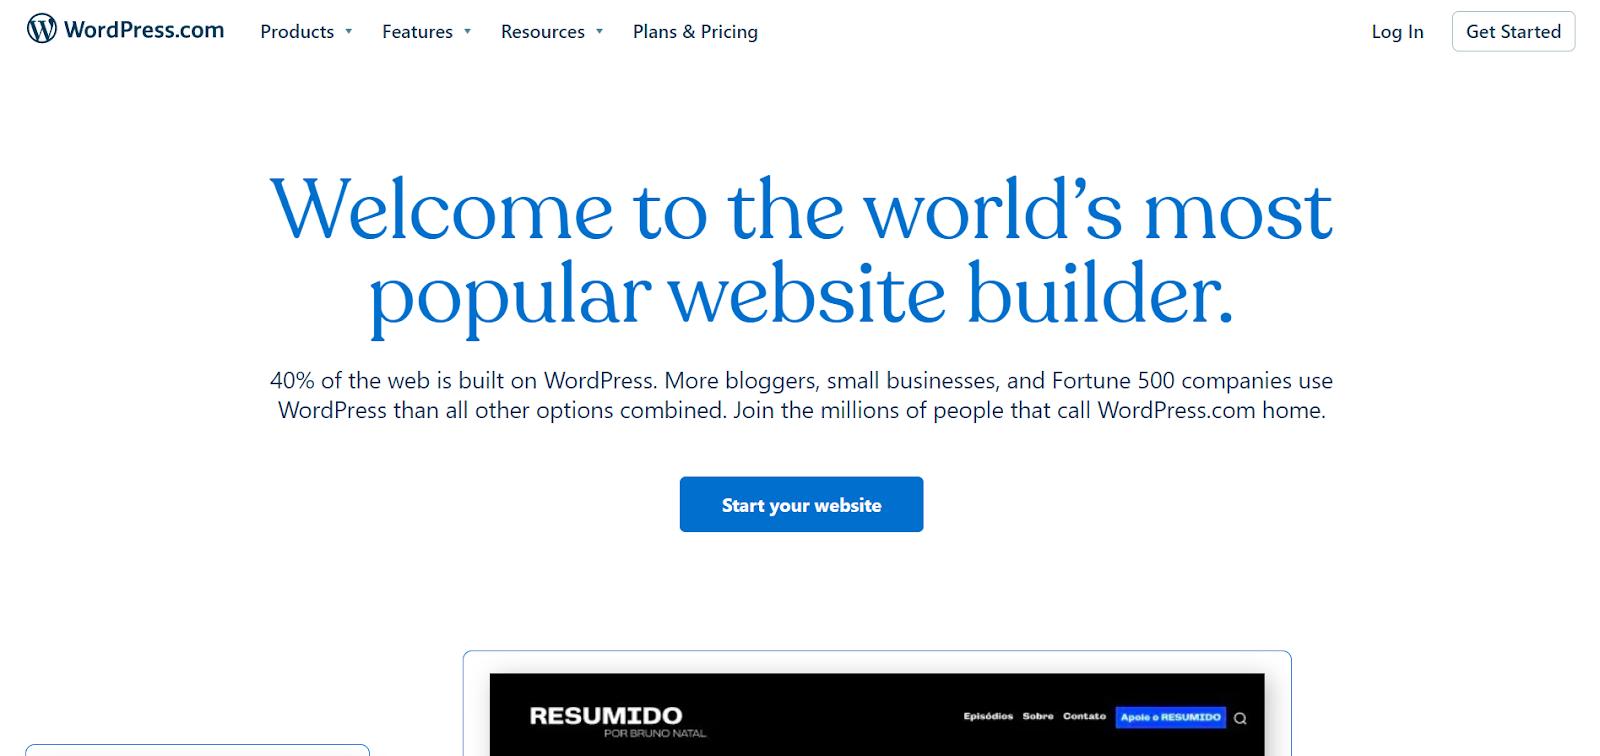 WordPress.com - the world's most popular website builder